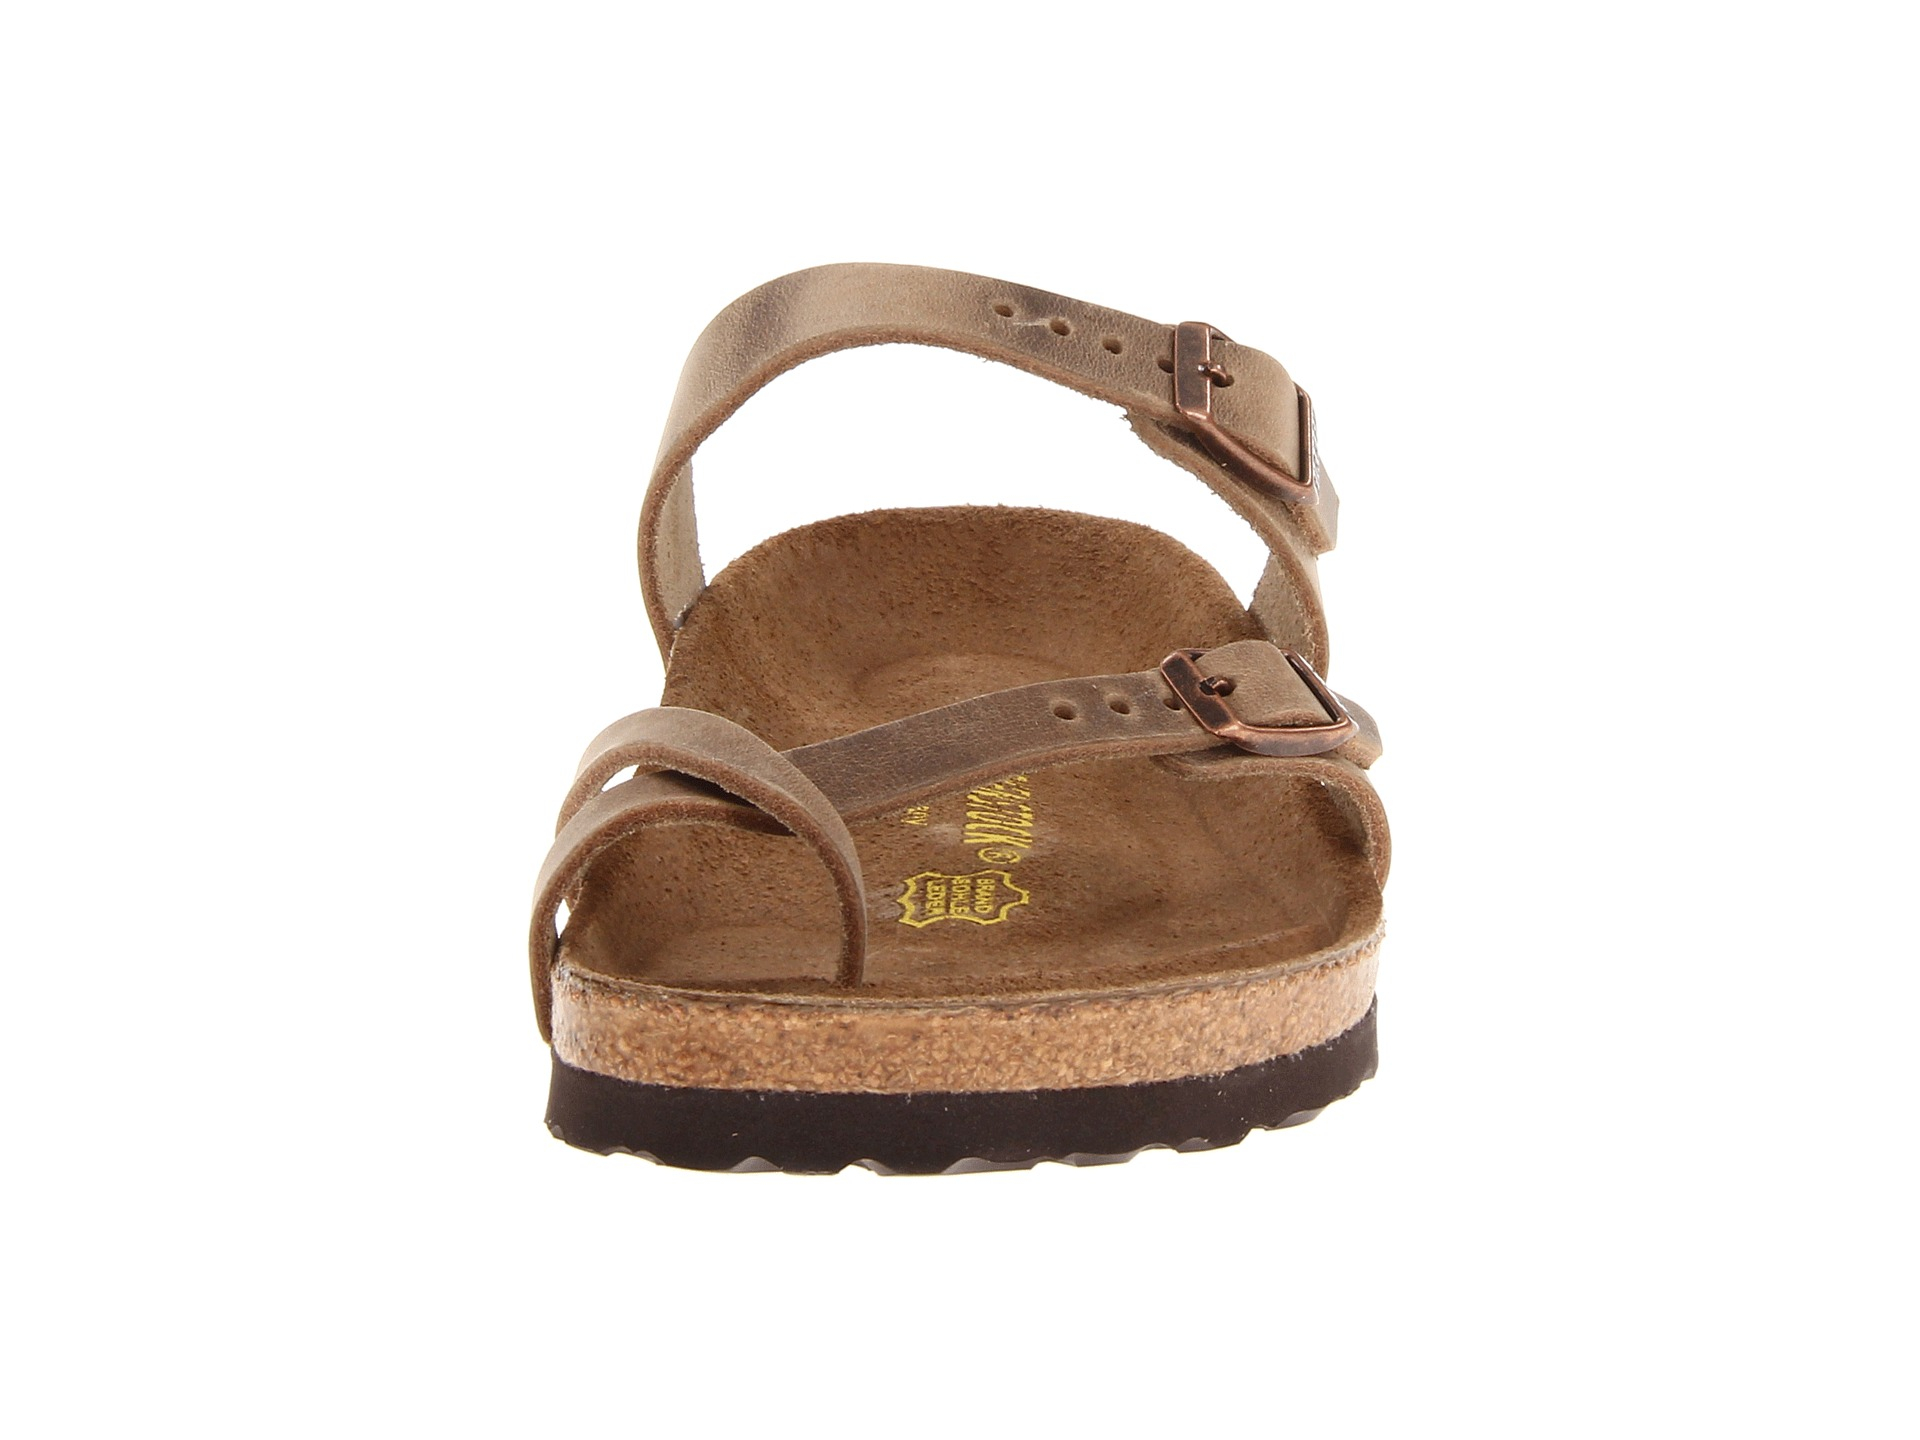 Mayari Birkenstock Sandals Oiled Tobacco Leather Sandals